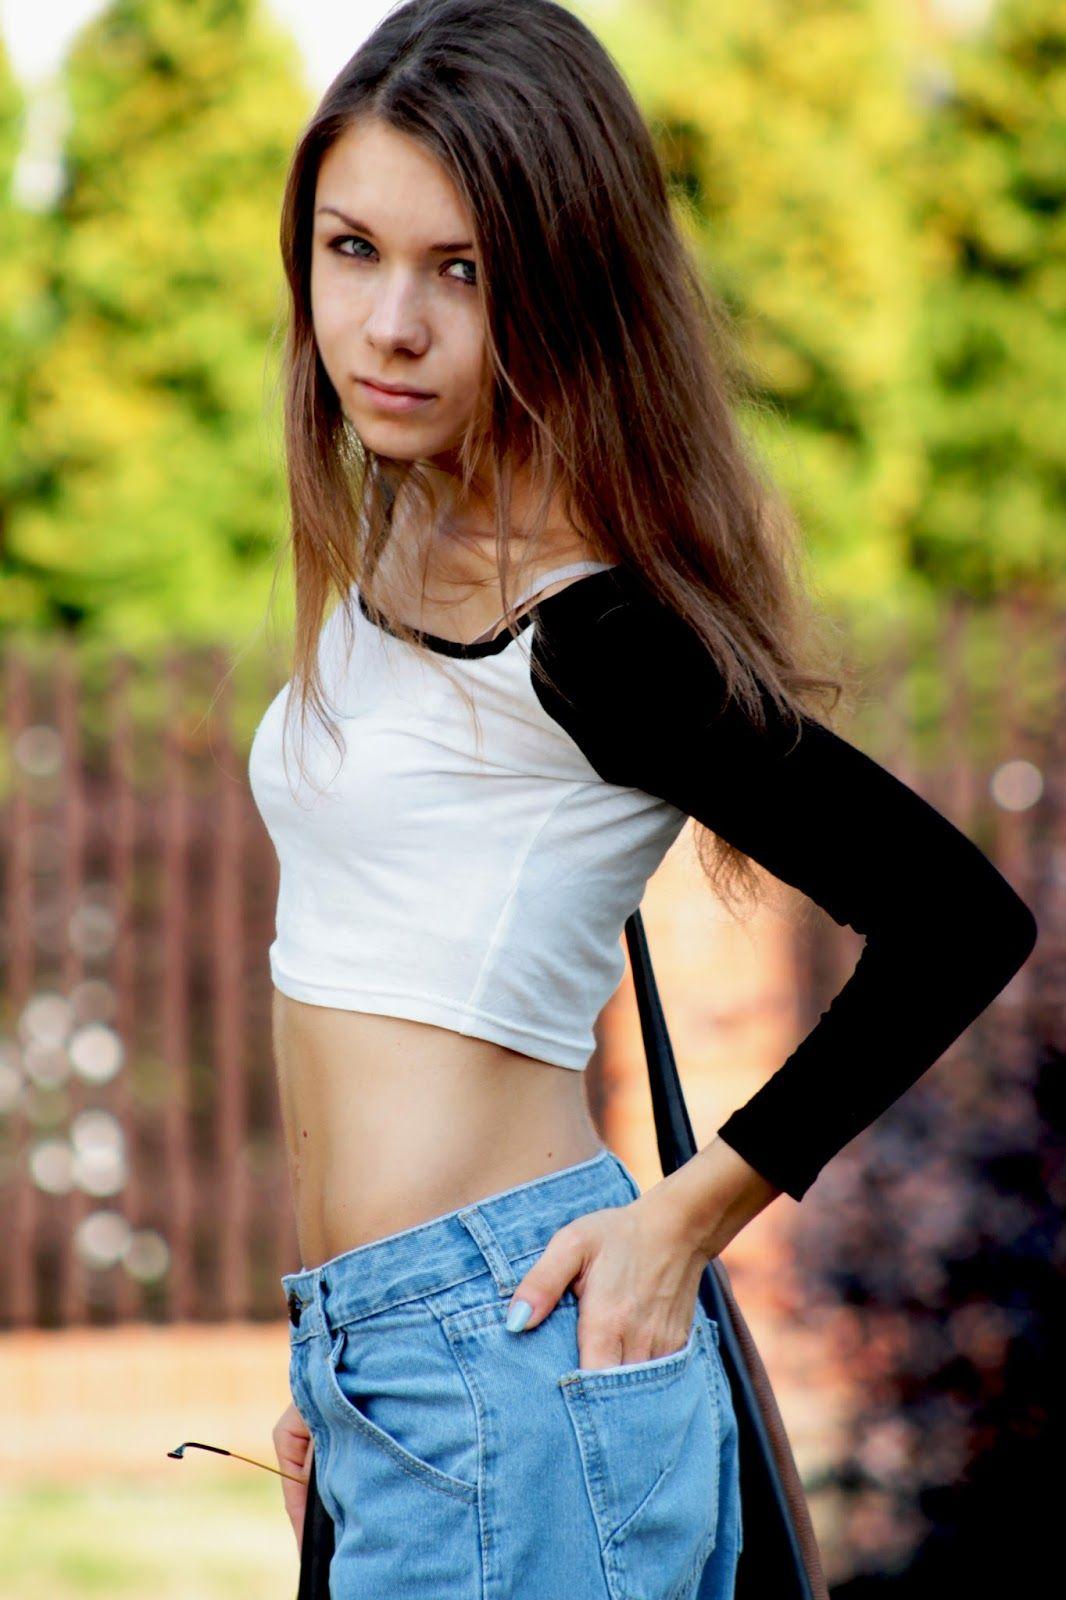 Pin By Werx On Bare Midriff Girls Dzinsy Chlopaka Krotki Top Top